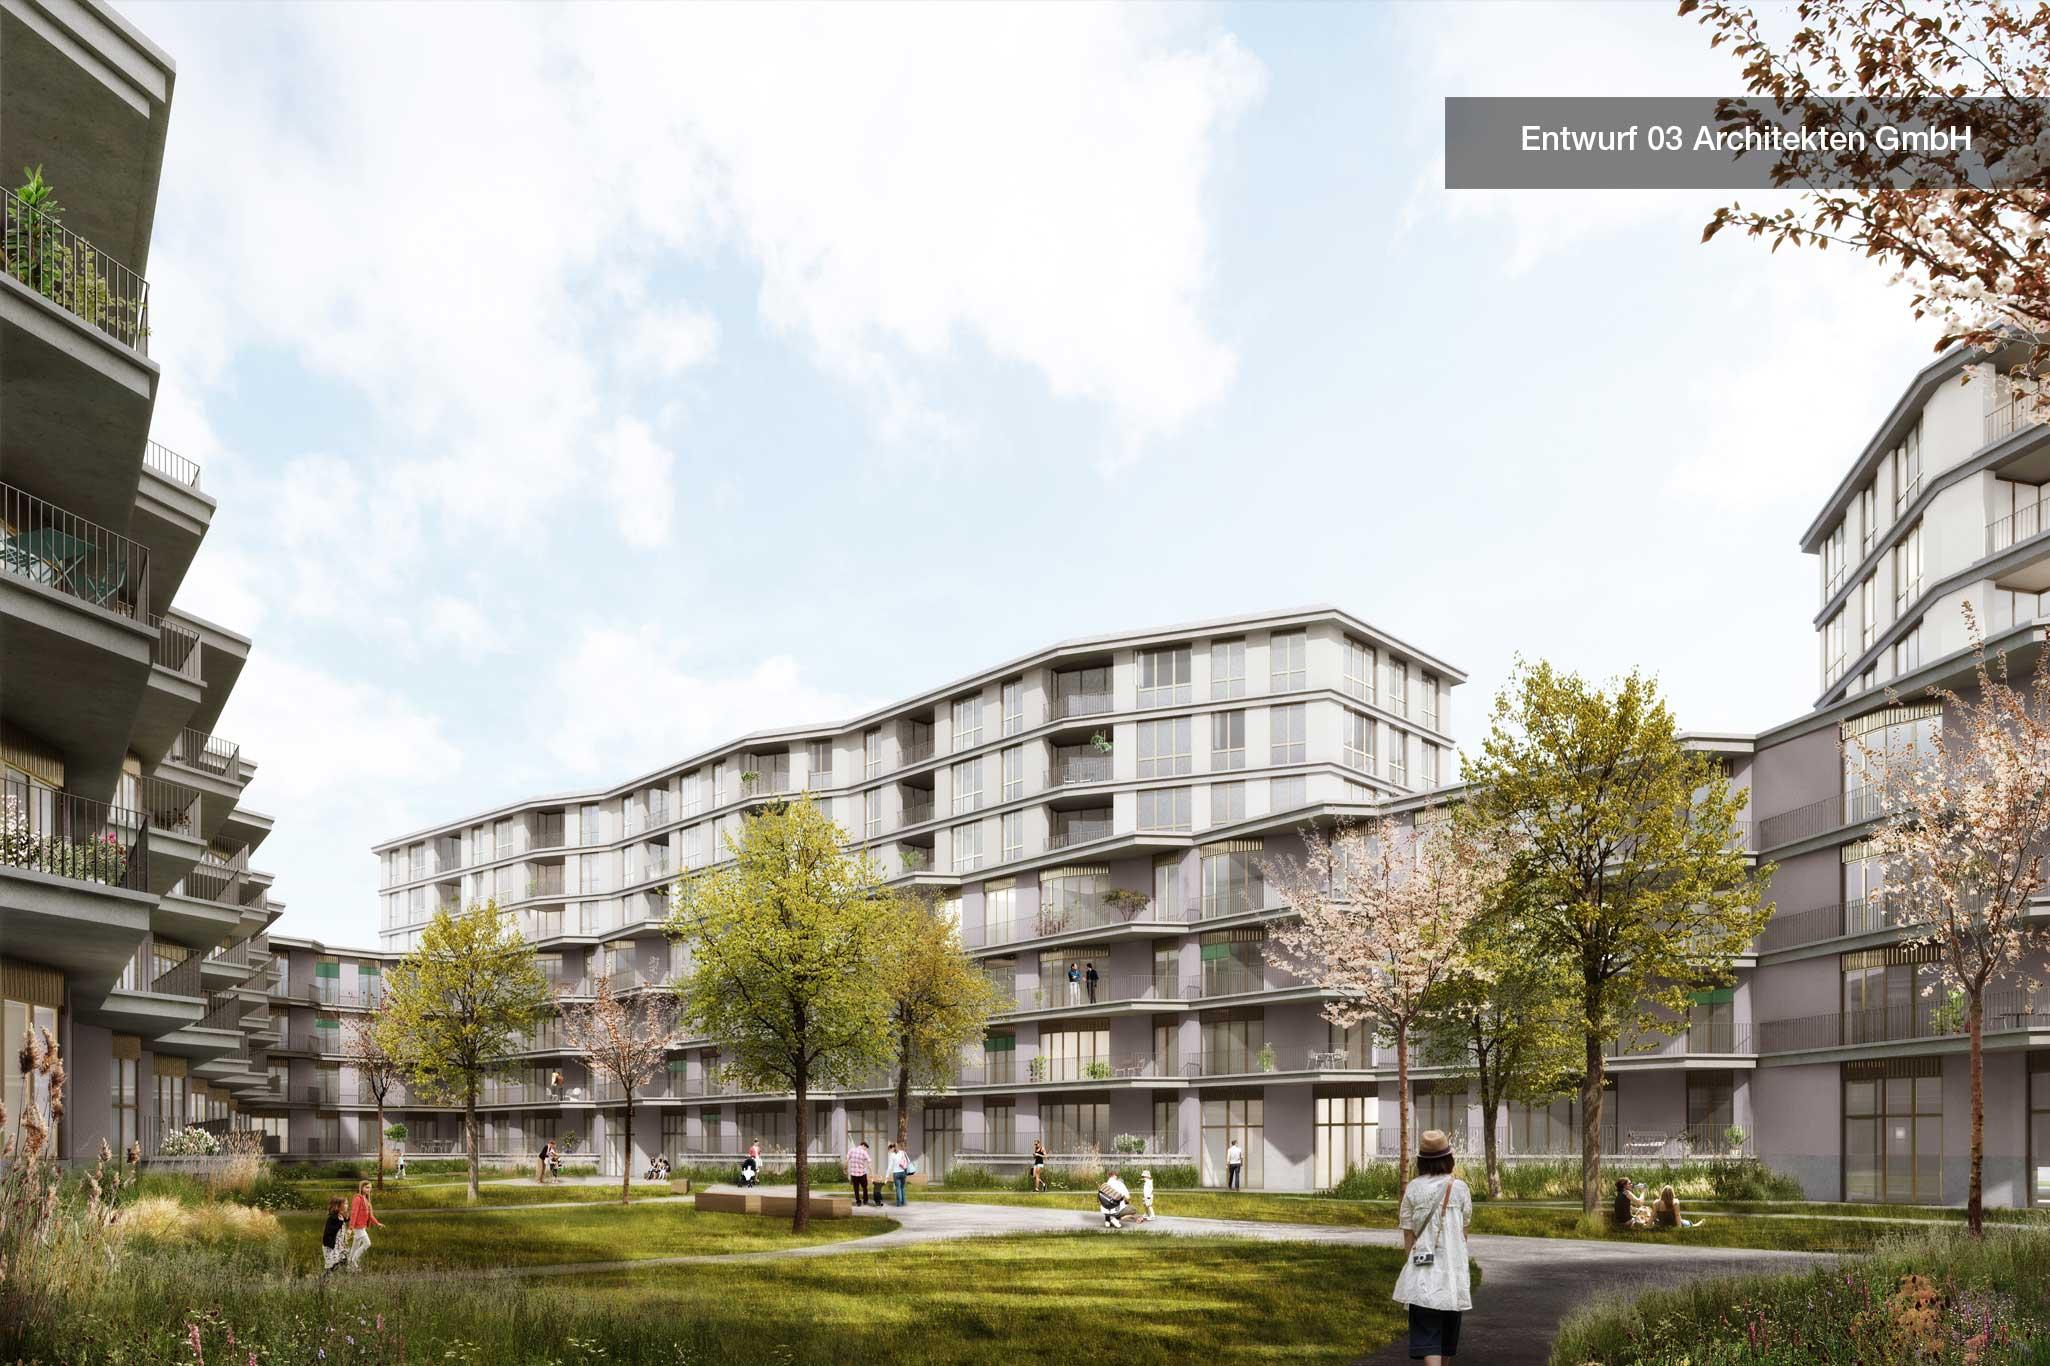 Entwurf 03 Architekten Hof